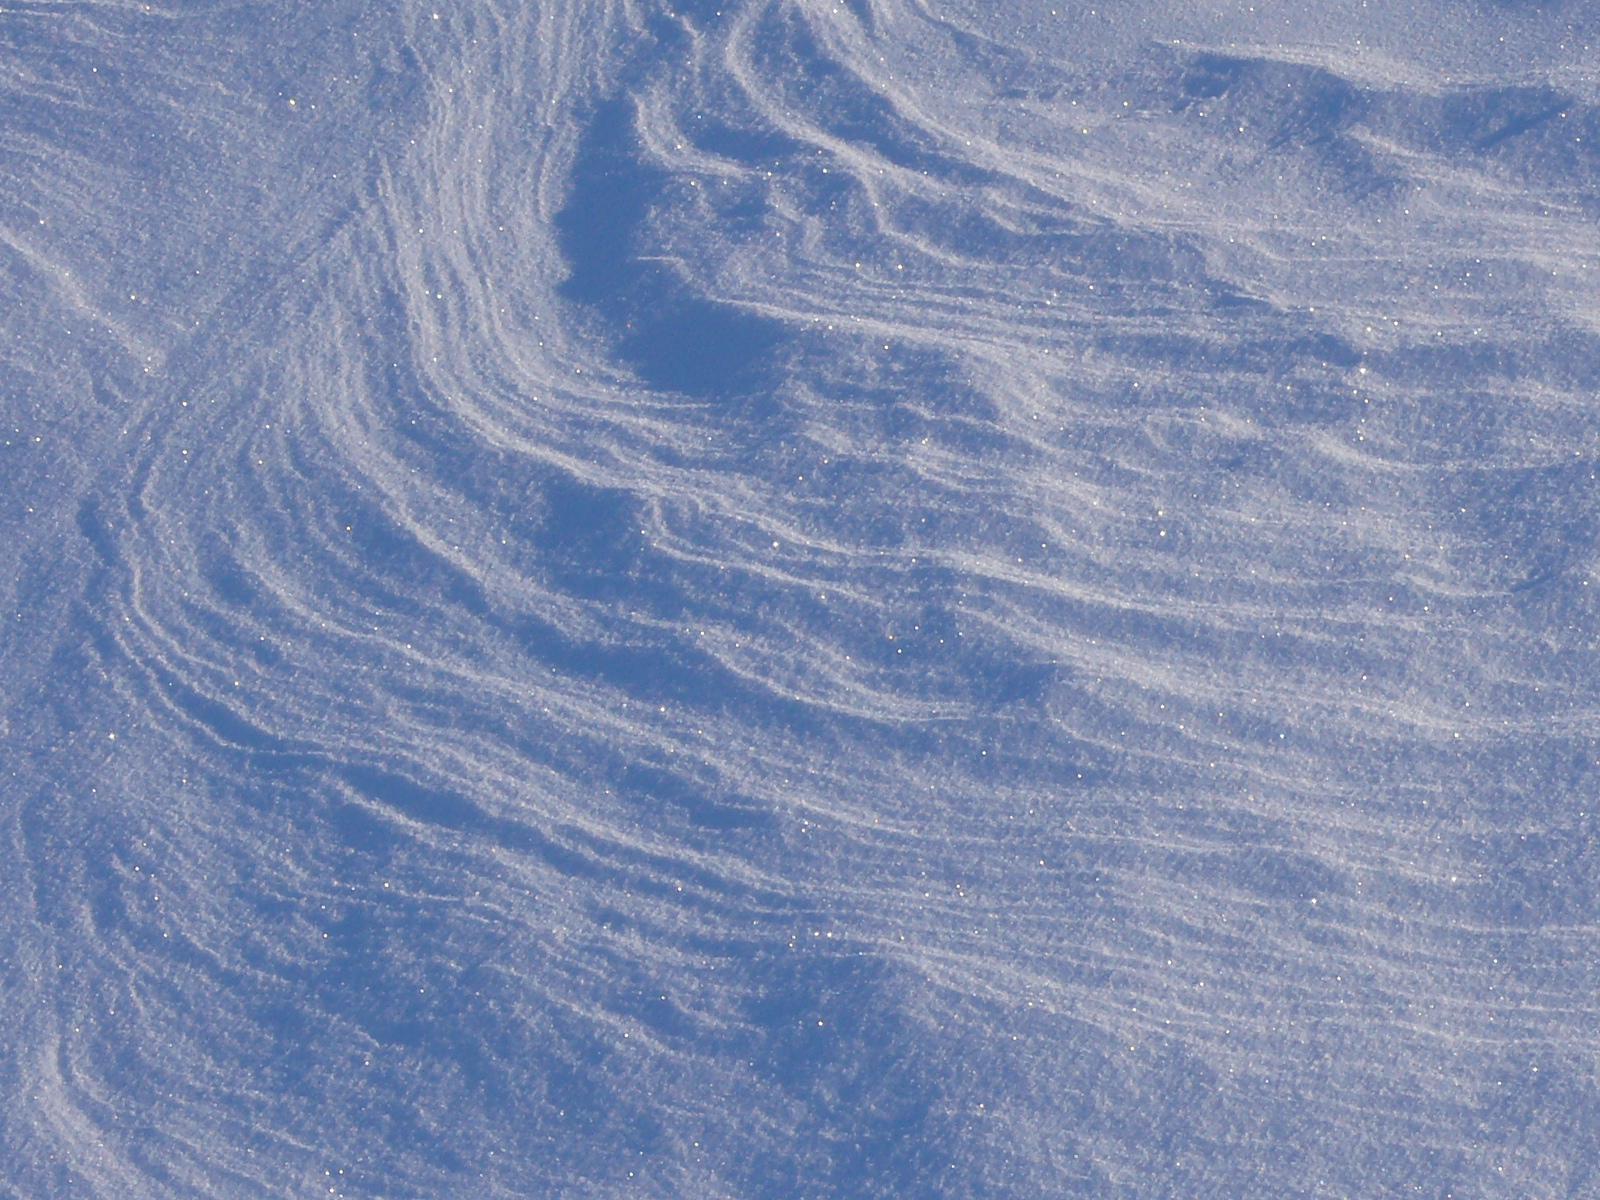 Pattern in snow, #1.